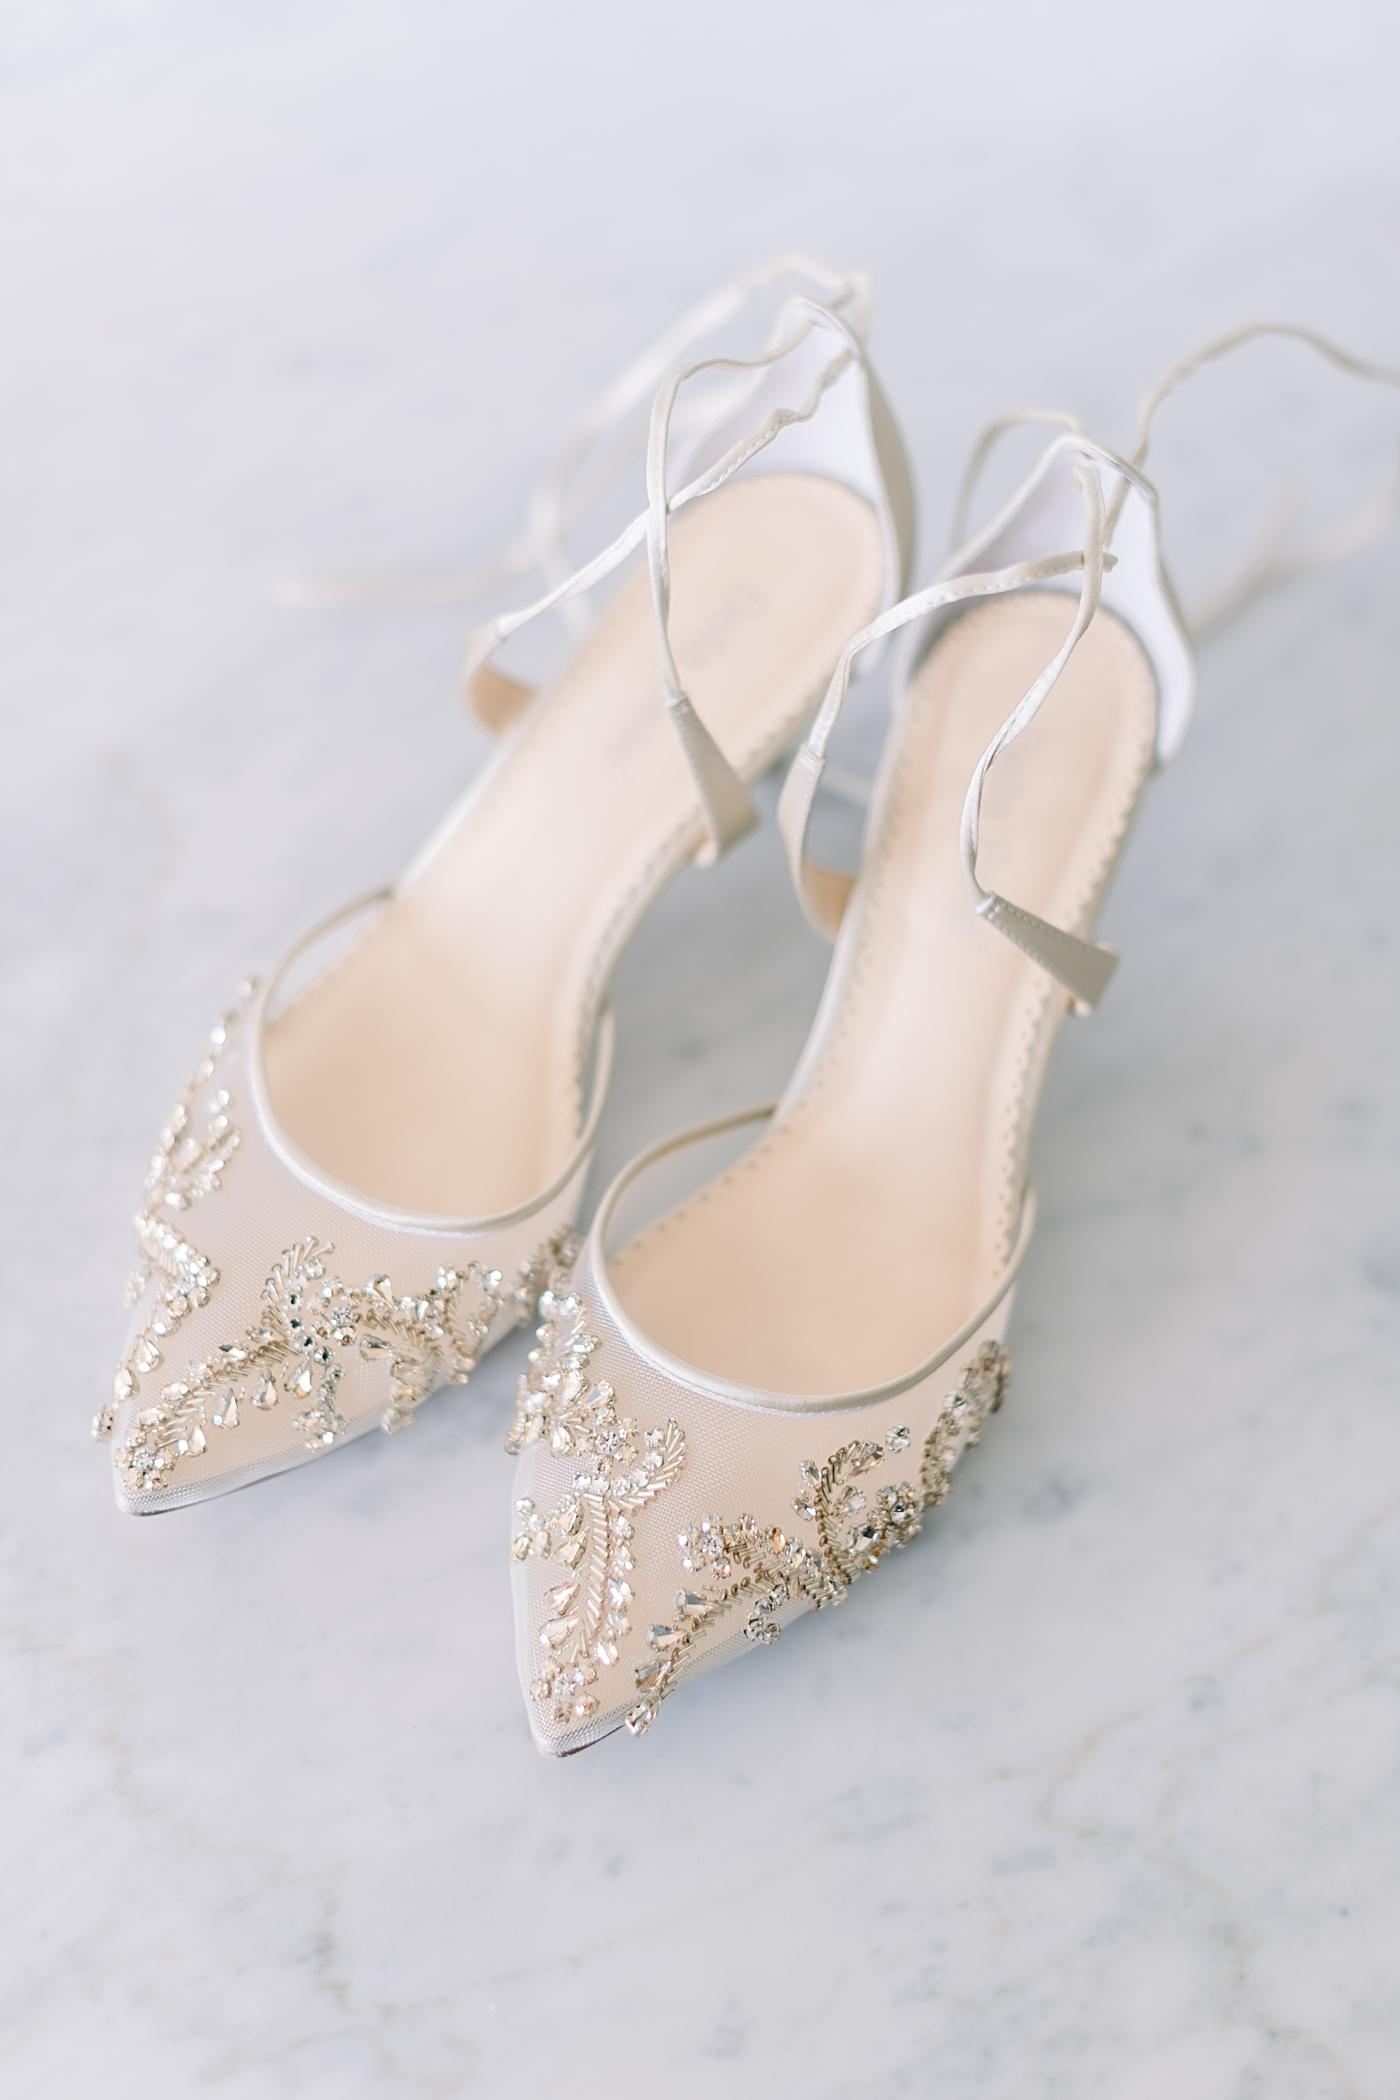 Bella Belle lace up wedding shoes